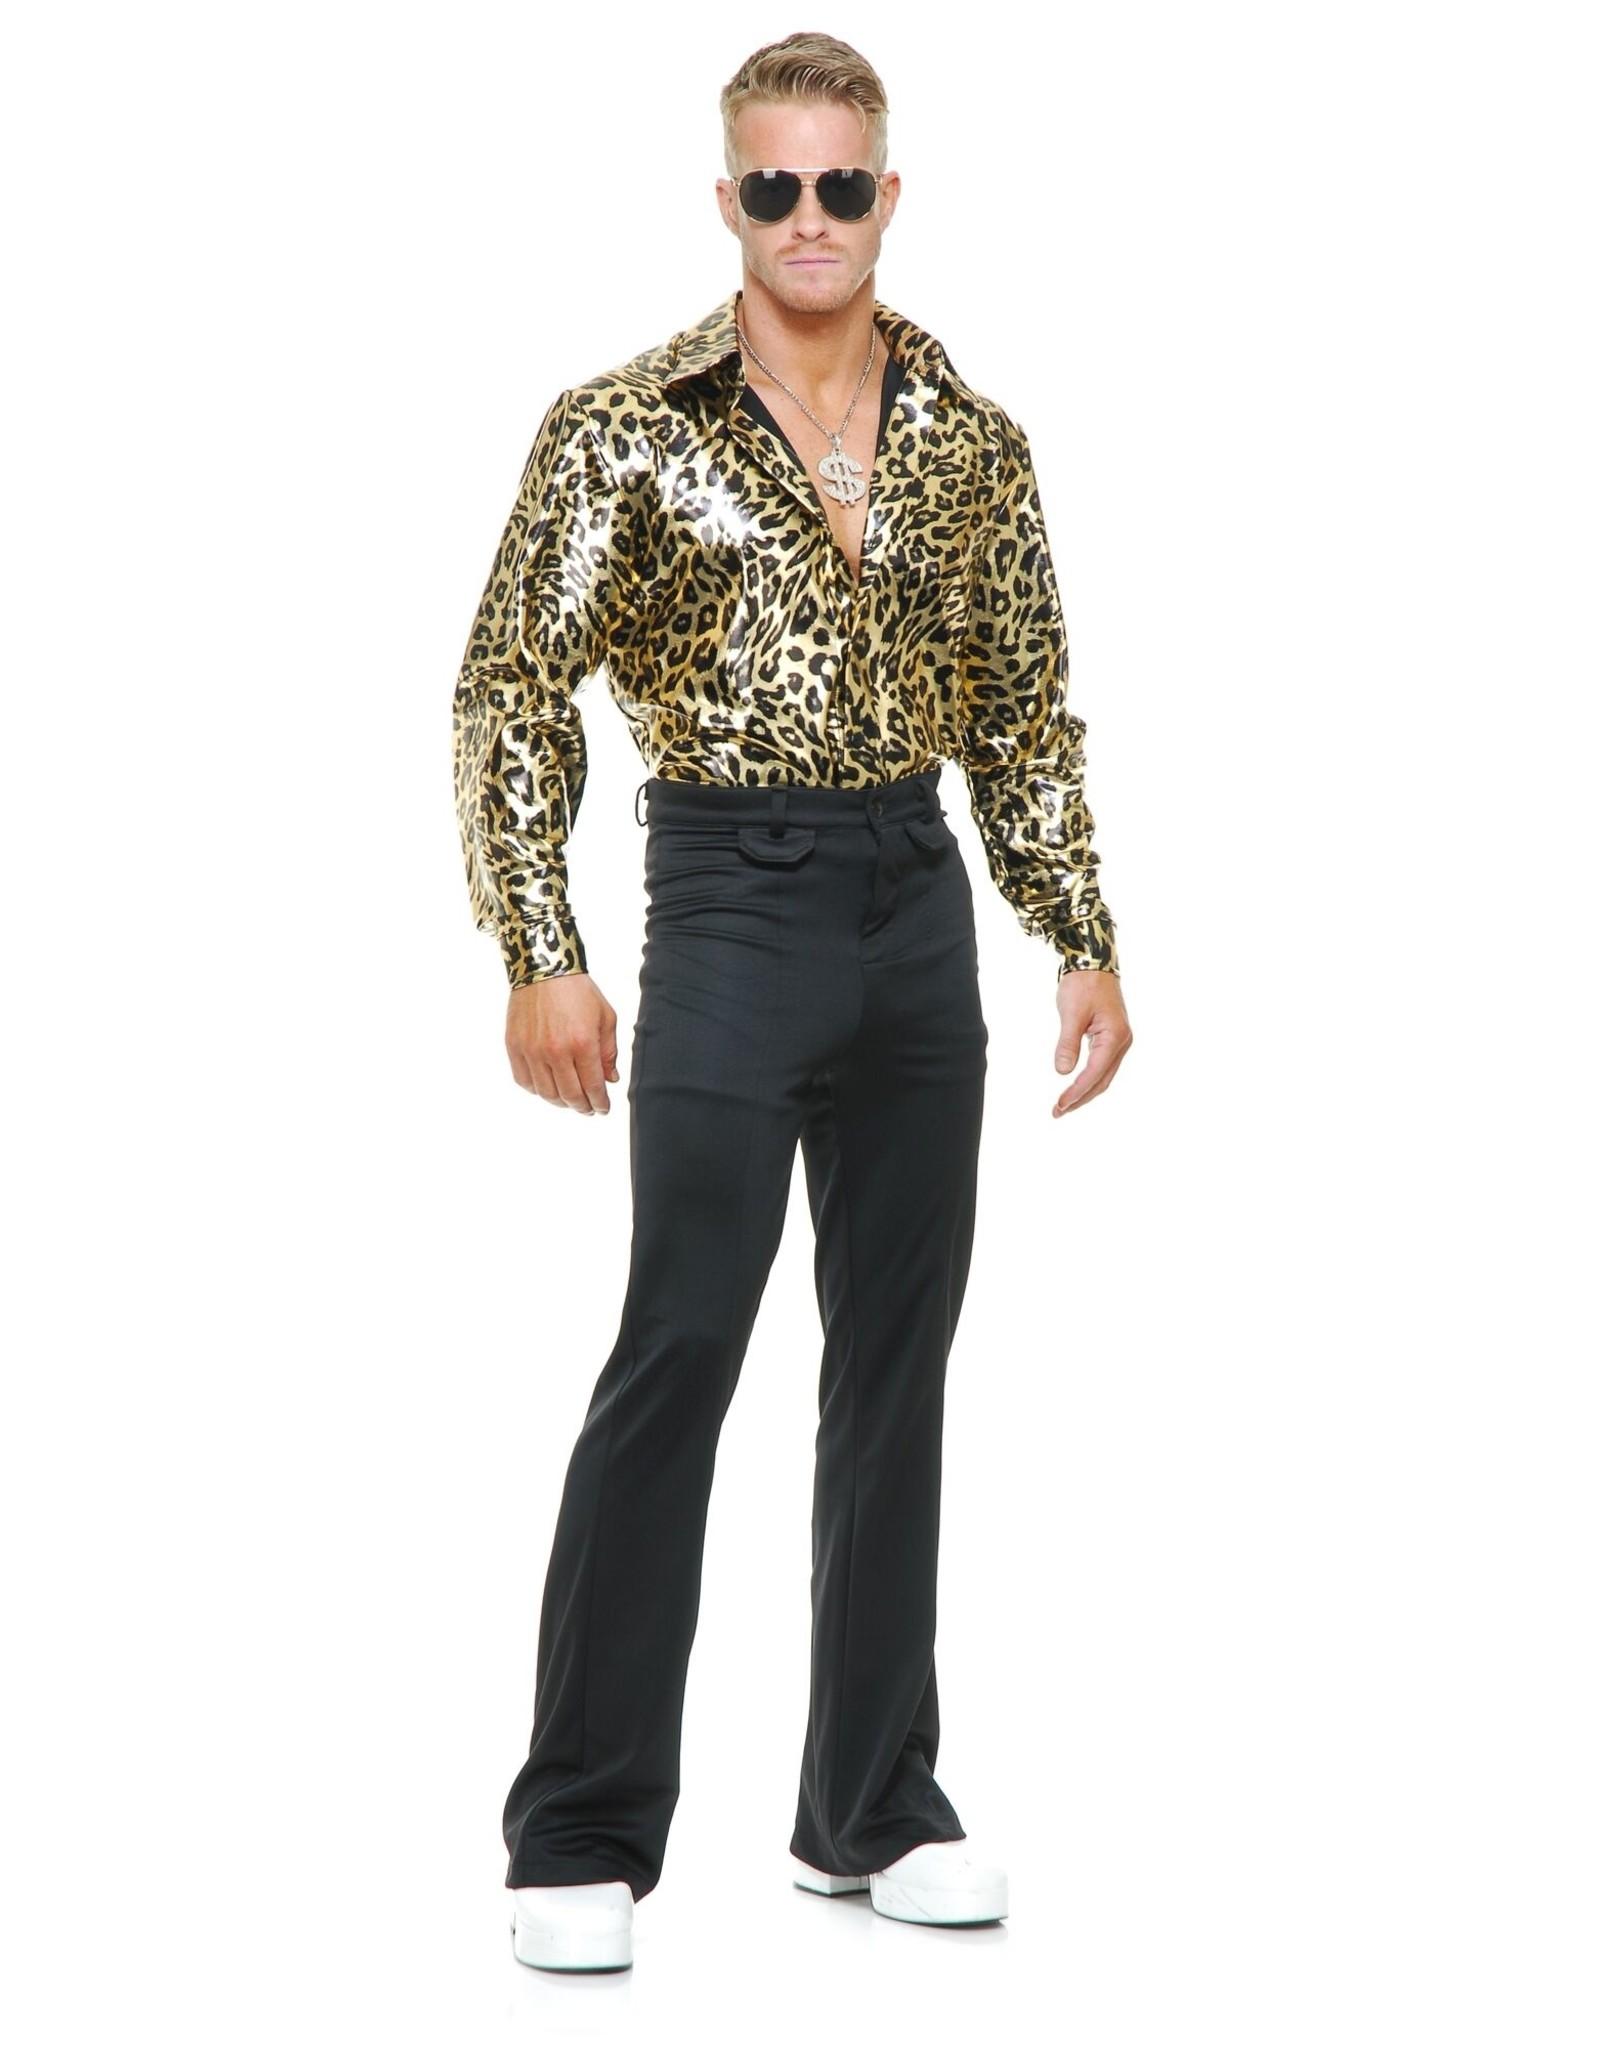 Charades Leopard Disco Shirt